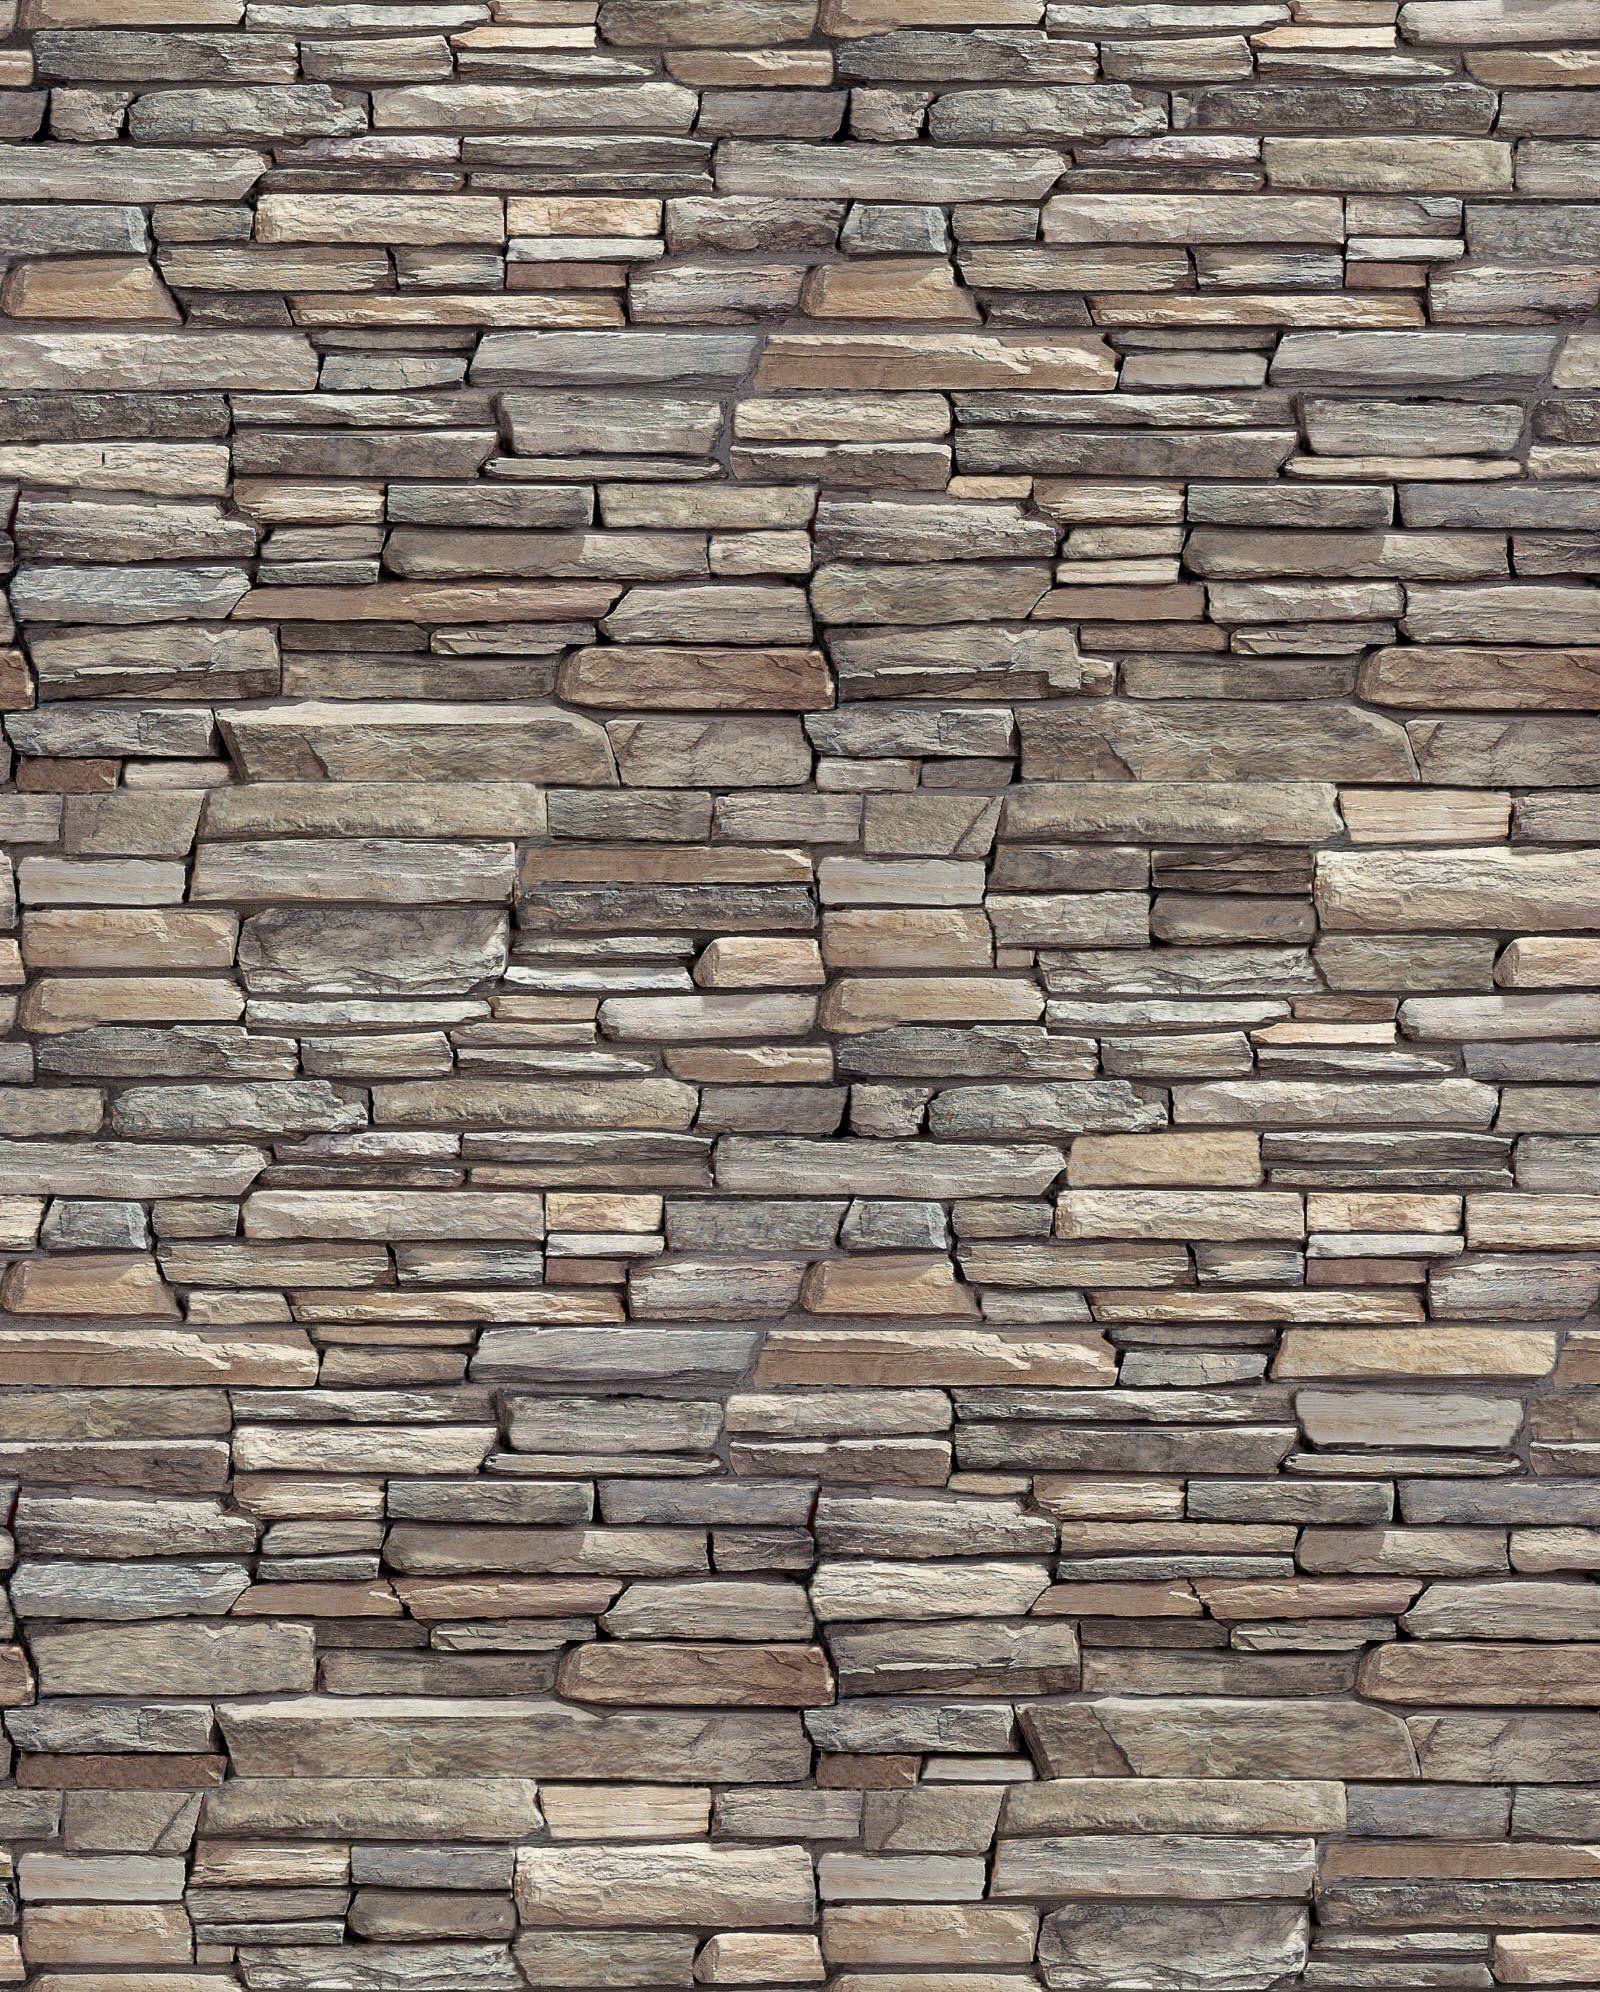 textura_muro_piedra_rustica_0648156001268947642jpg 16001992 - Pared Piedra